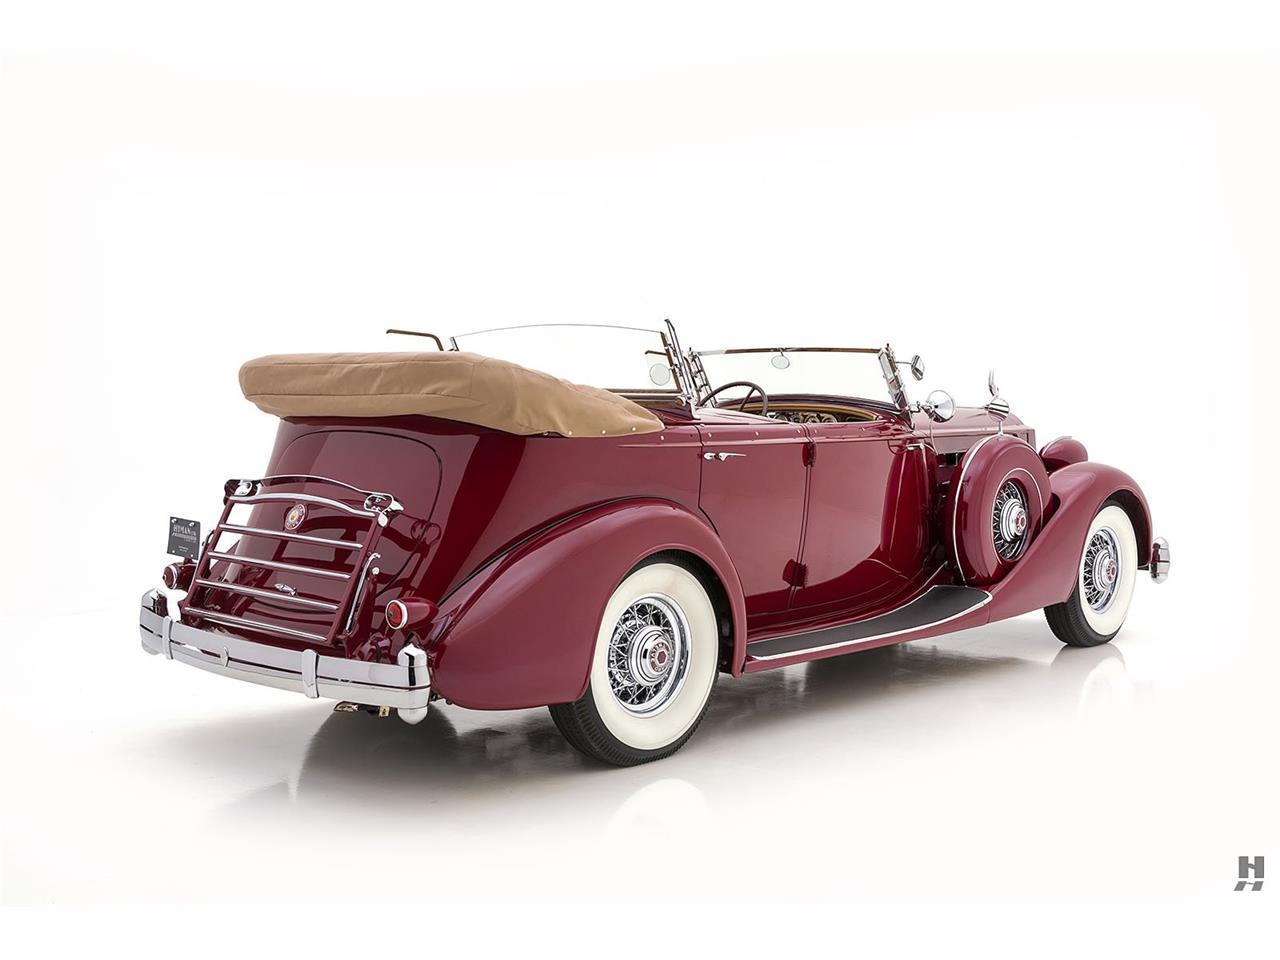 1936 Packard Twelve (CC-1393185) for sale in Saint Louis, Missouri